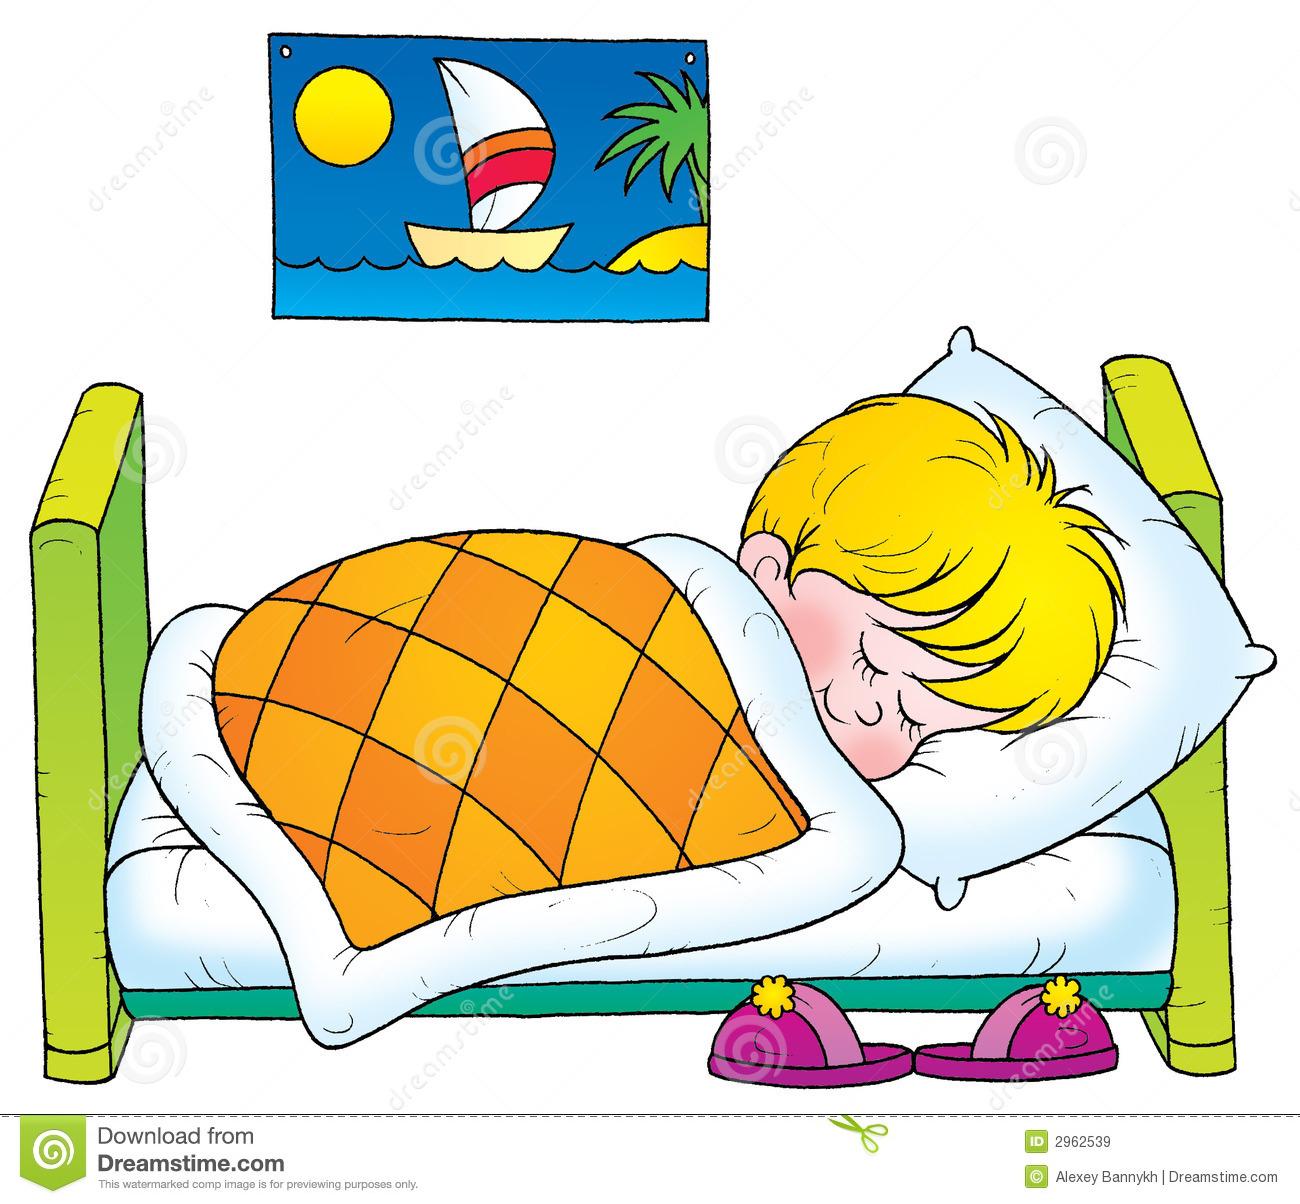 Kids sleeping clipart jpg black and white Sleep Clipart Sleeping | Clipart Panda - Free Clipart Images jpg black and white